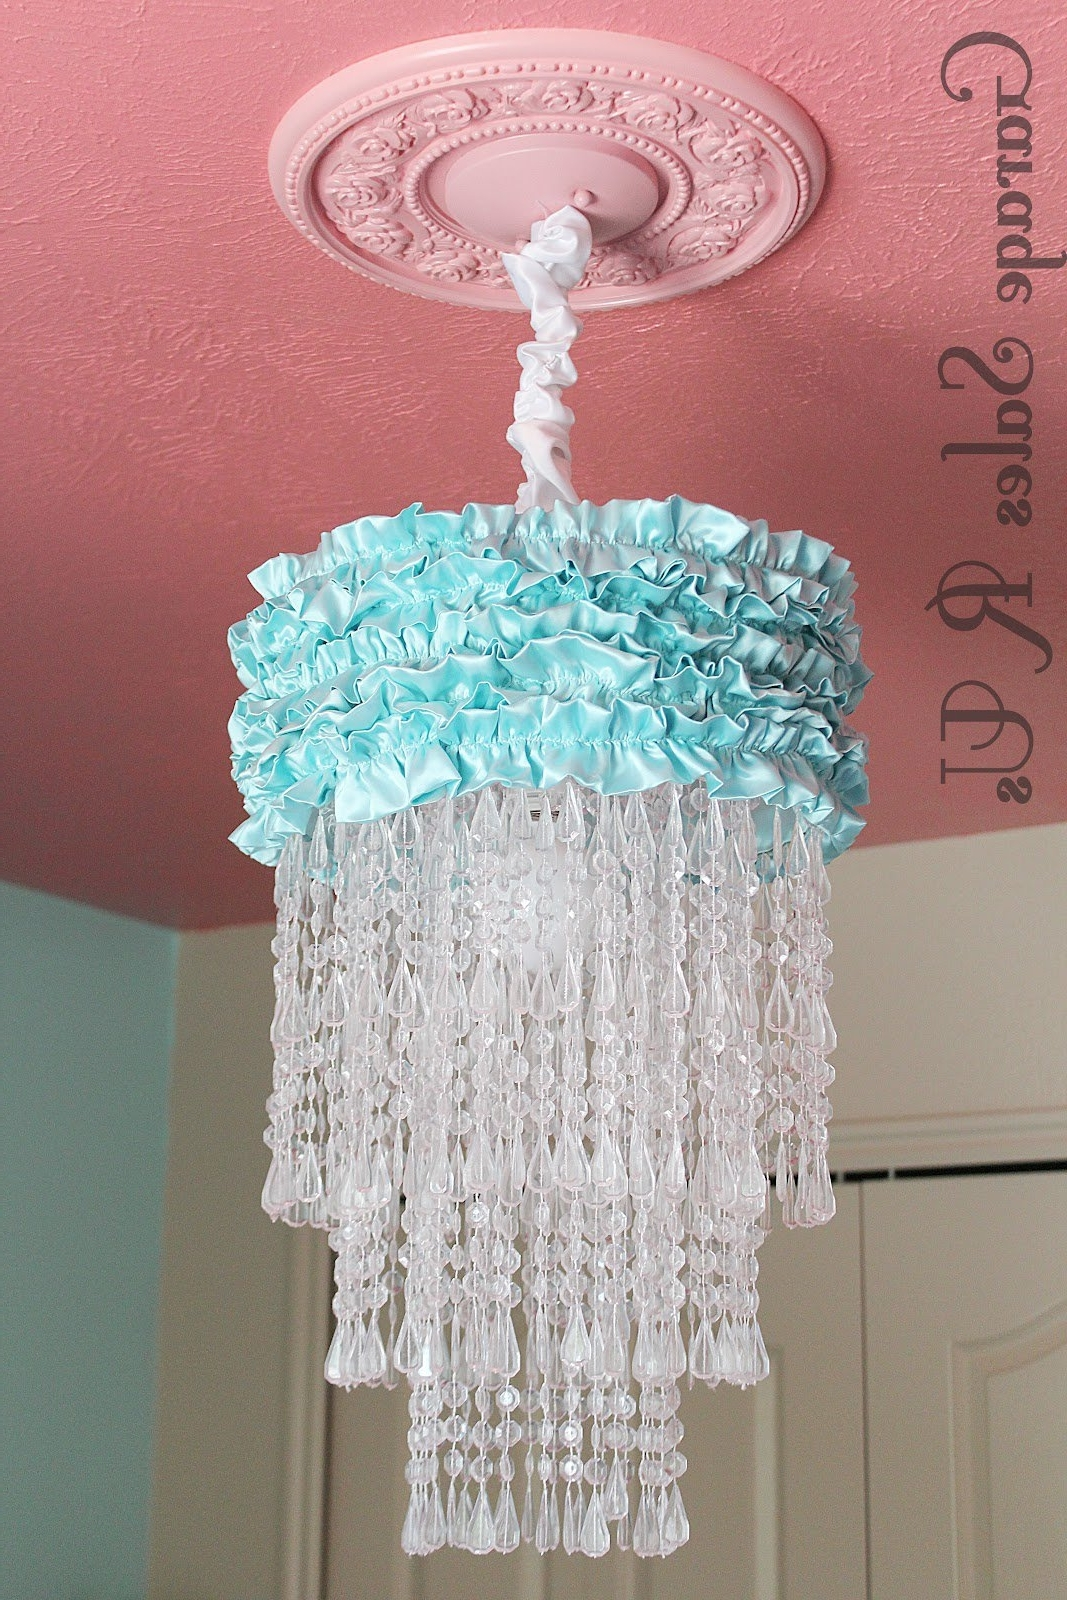 Diy Turquoise Beaded Chandeliers Regarding Latest 25 Diy Chandelier Ideas (View 14 of 20)